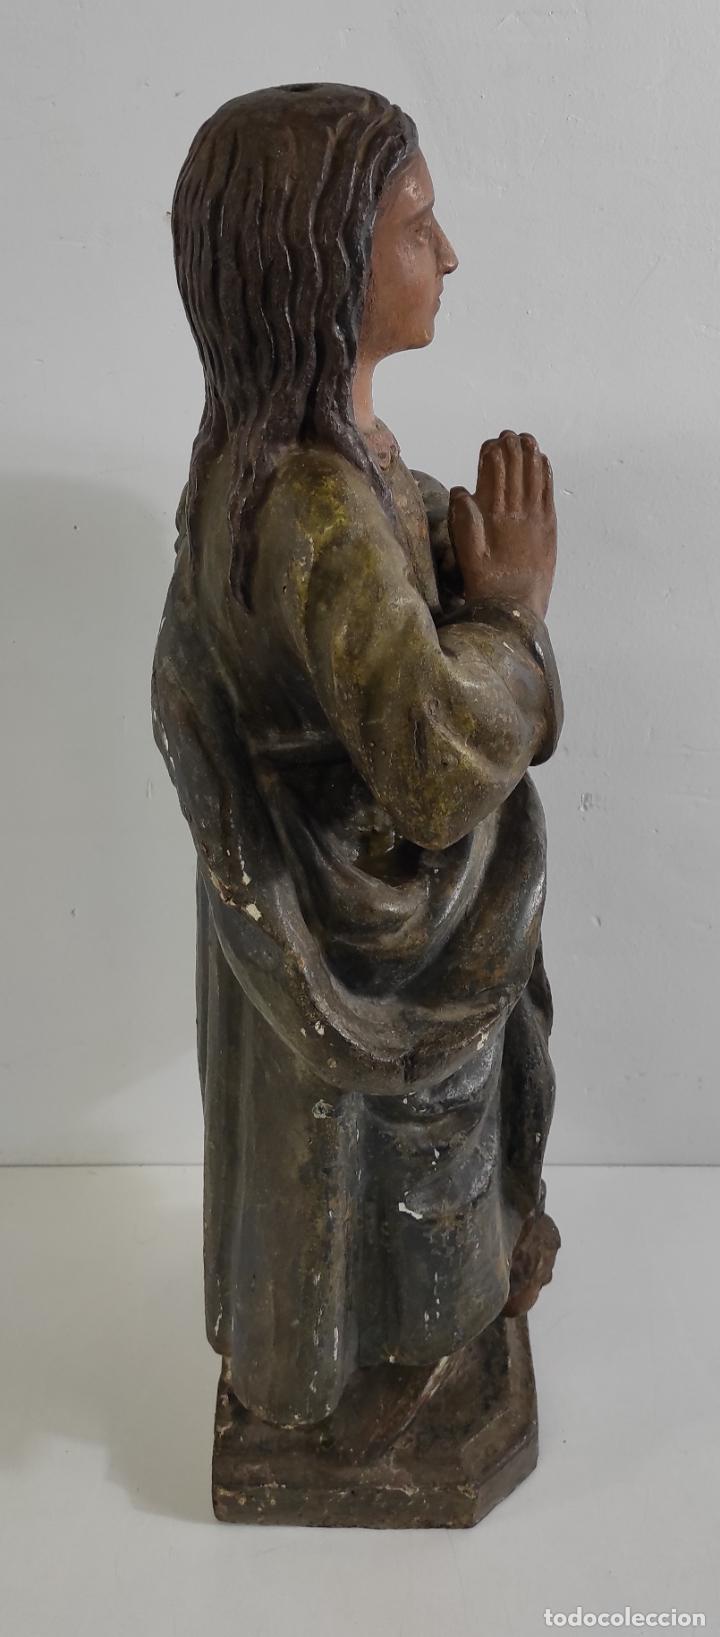 Arte: Virgen Purísima - Talla Popular en Madera de Encina Policromada - Escuela Catalana - S. XVII - Foto 7 - 254490140